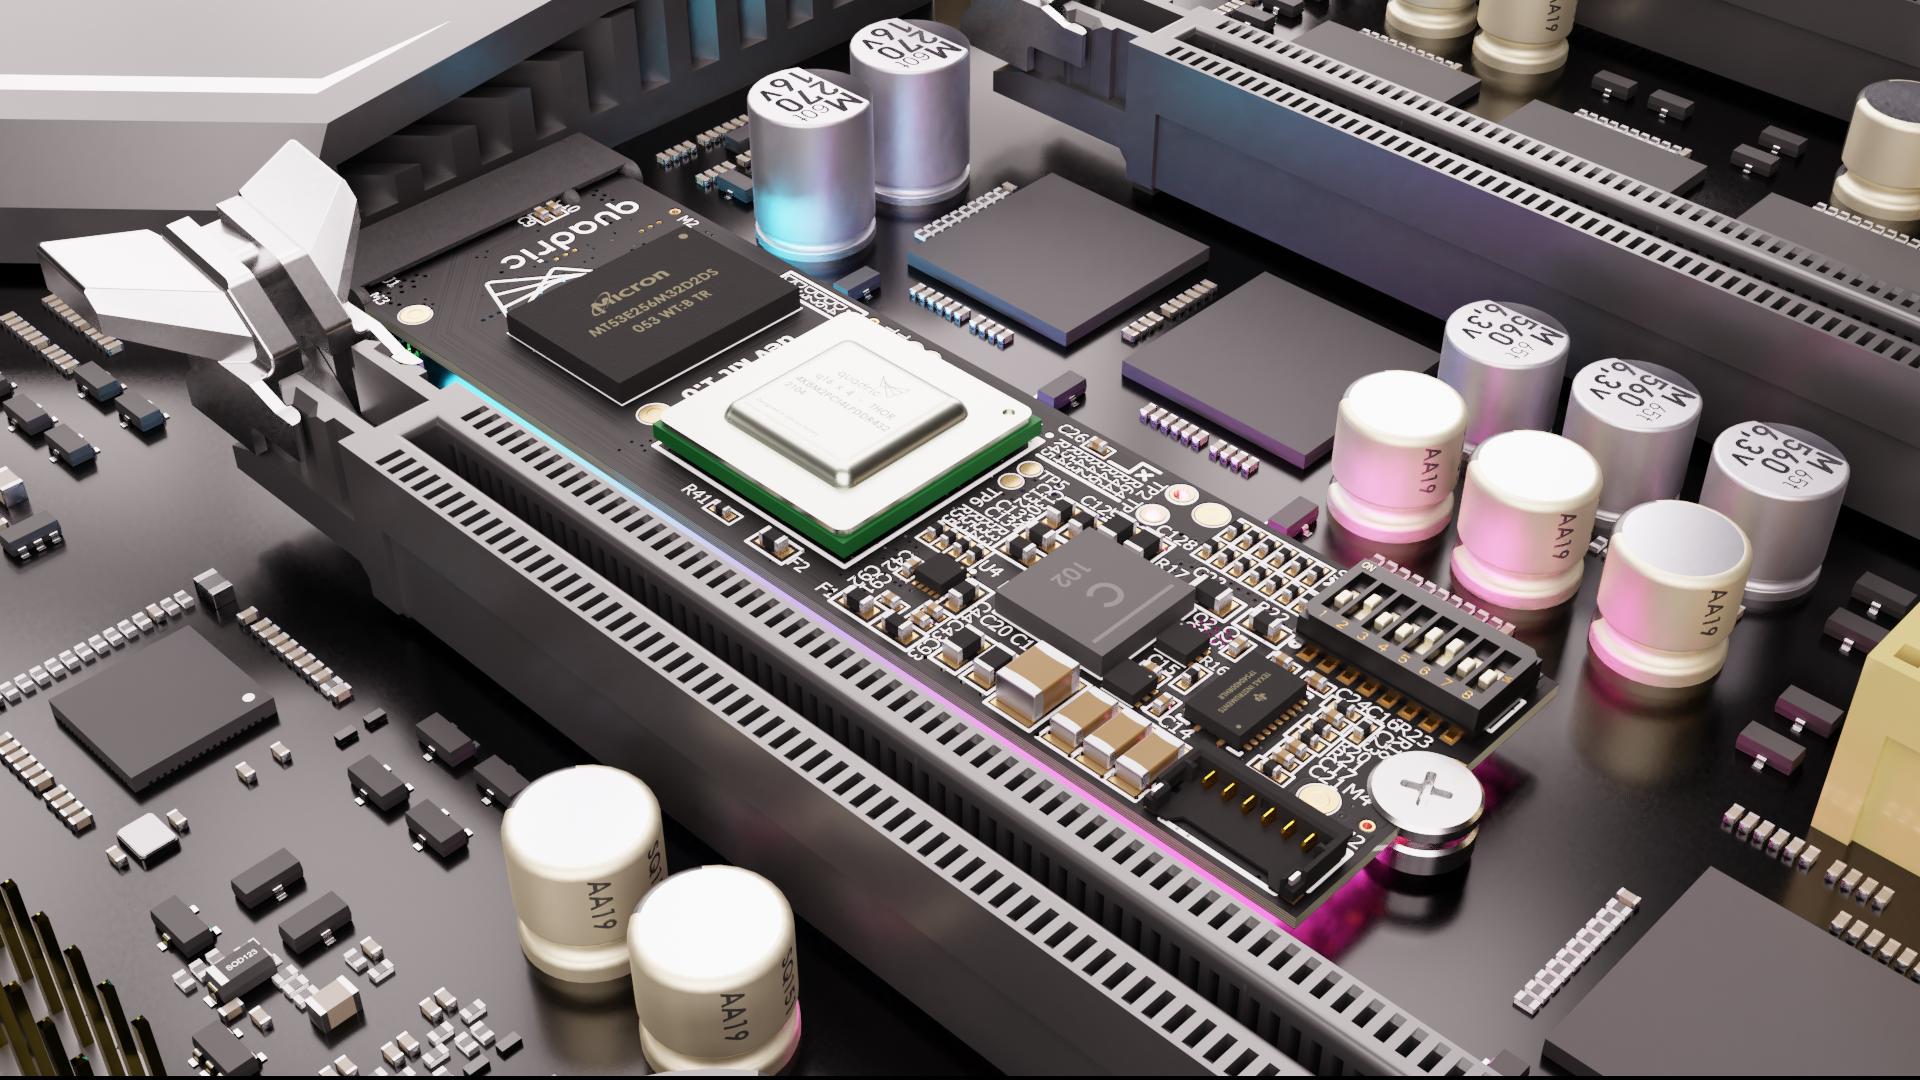 The quadric Dev Kit inside of an ATX form factor host system.